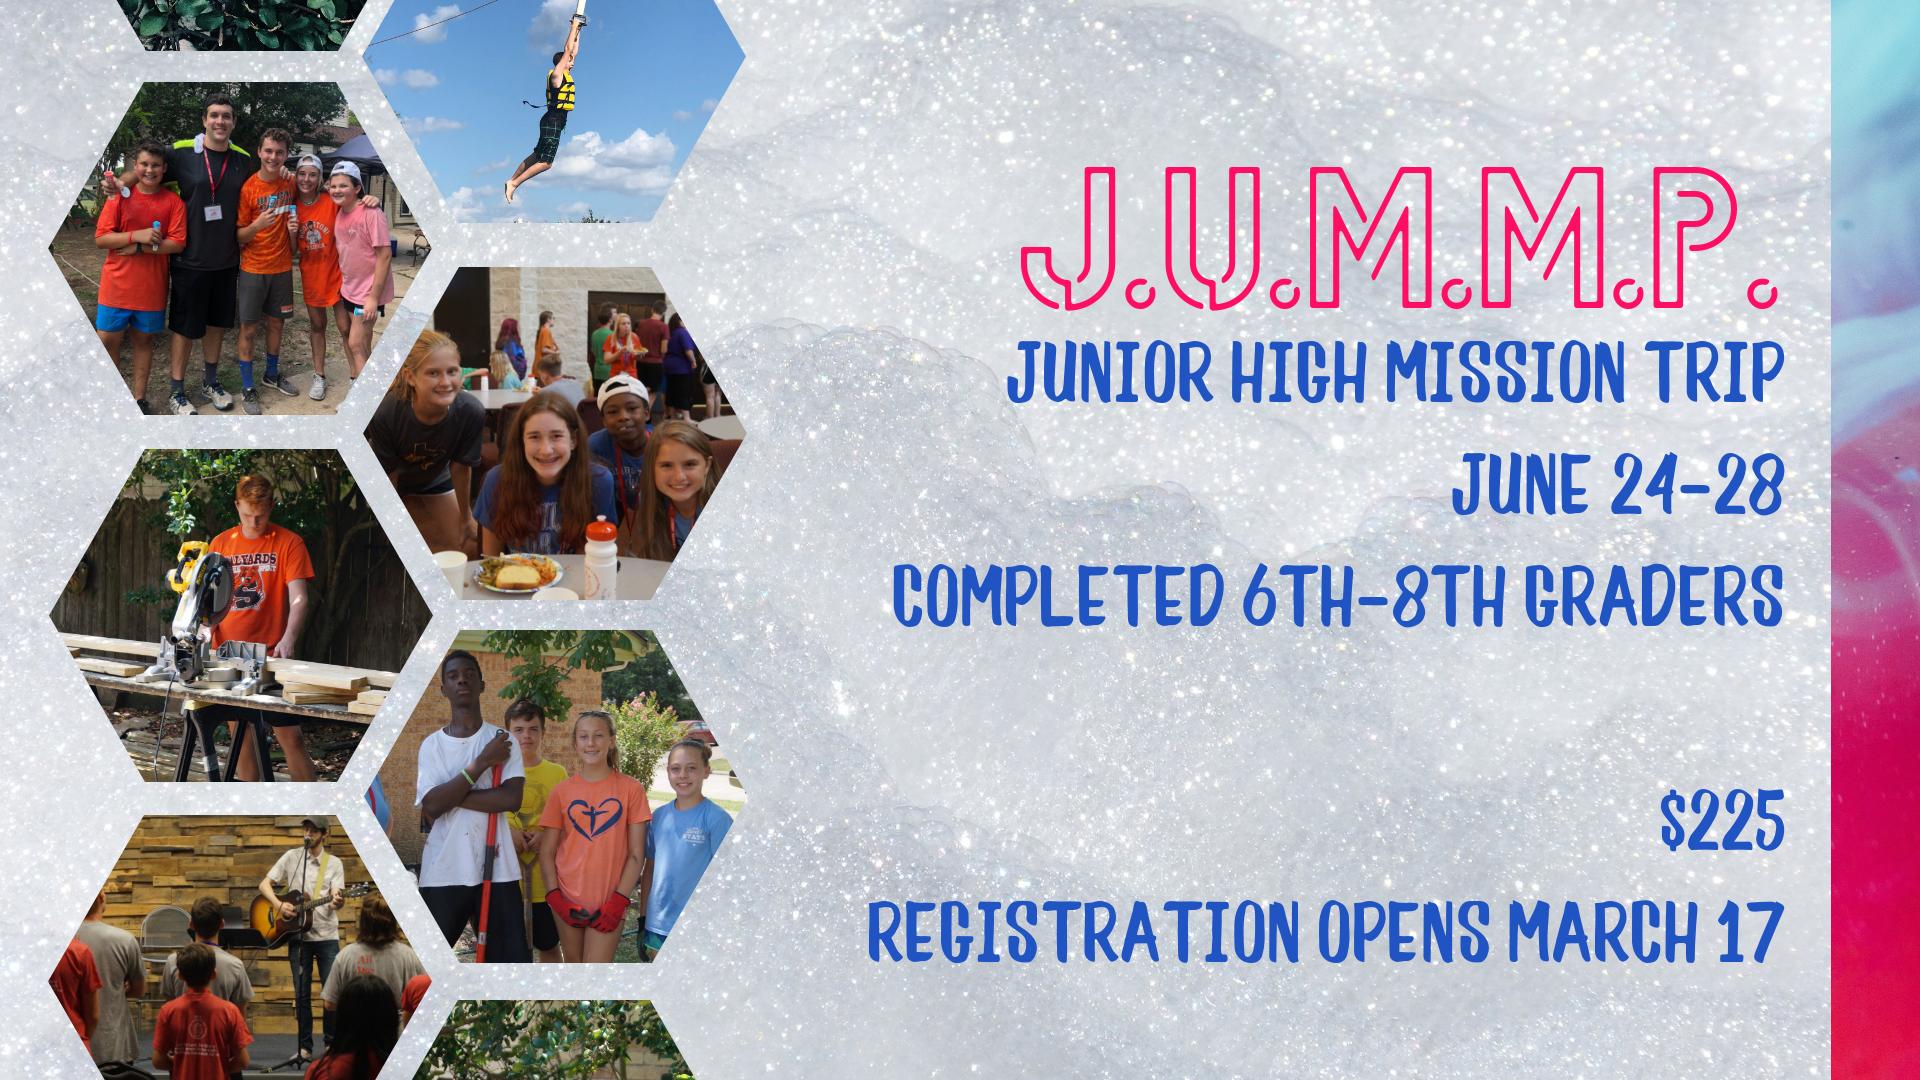 jummp 2019 web size.png